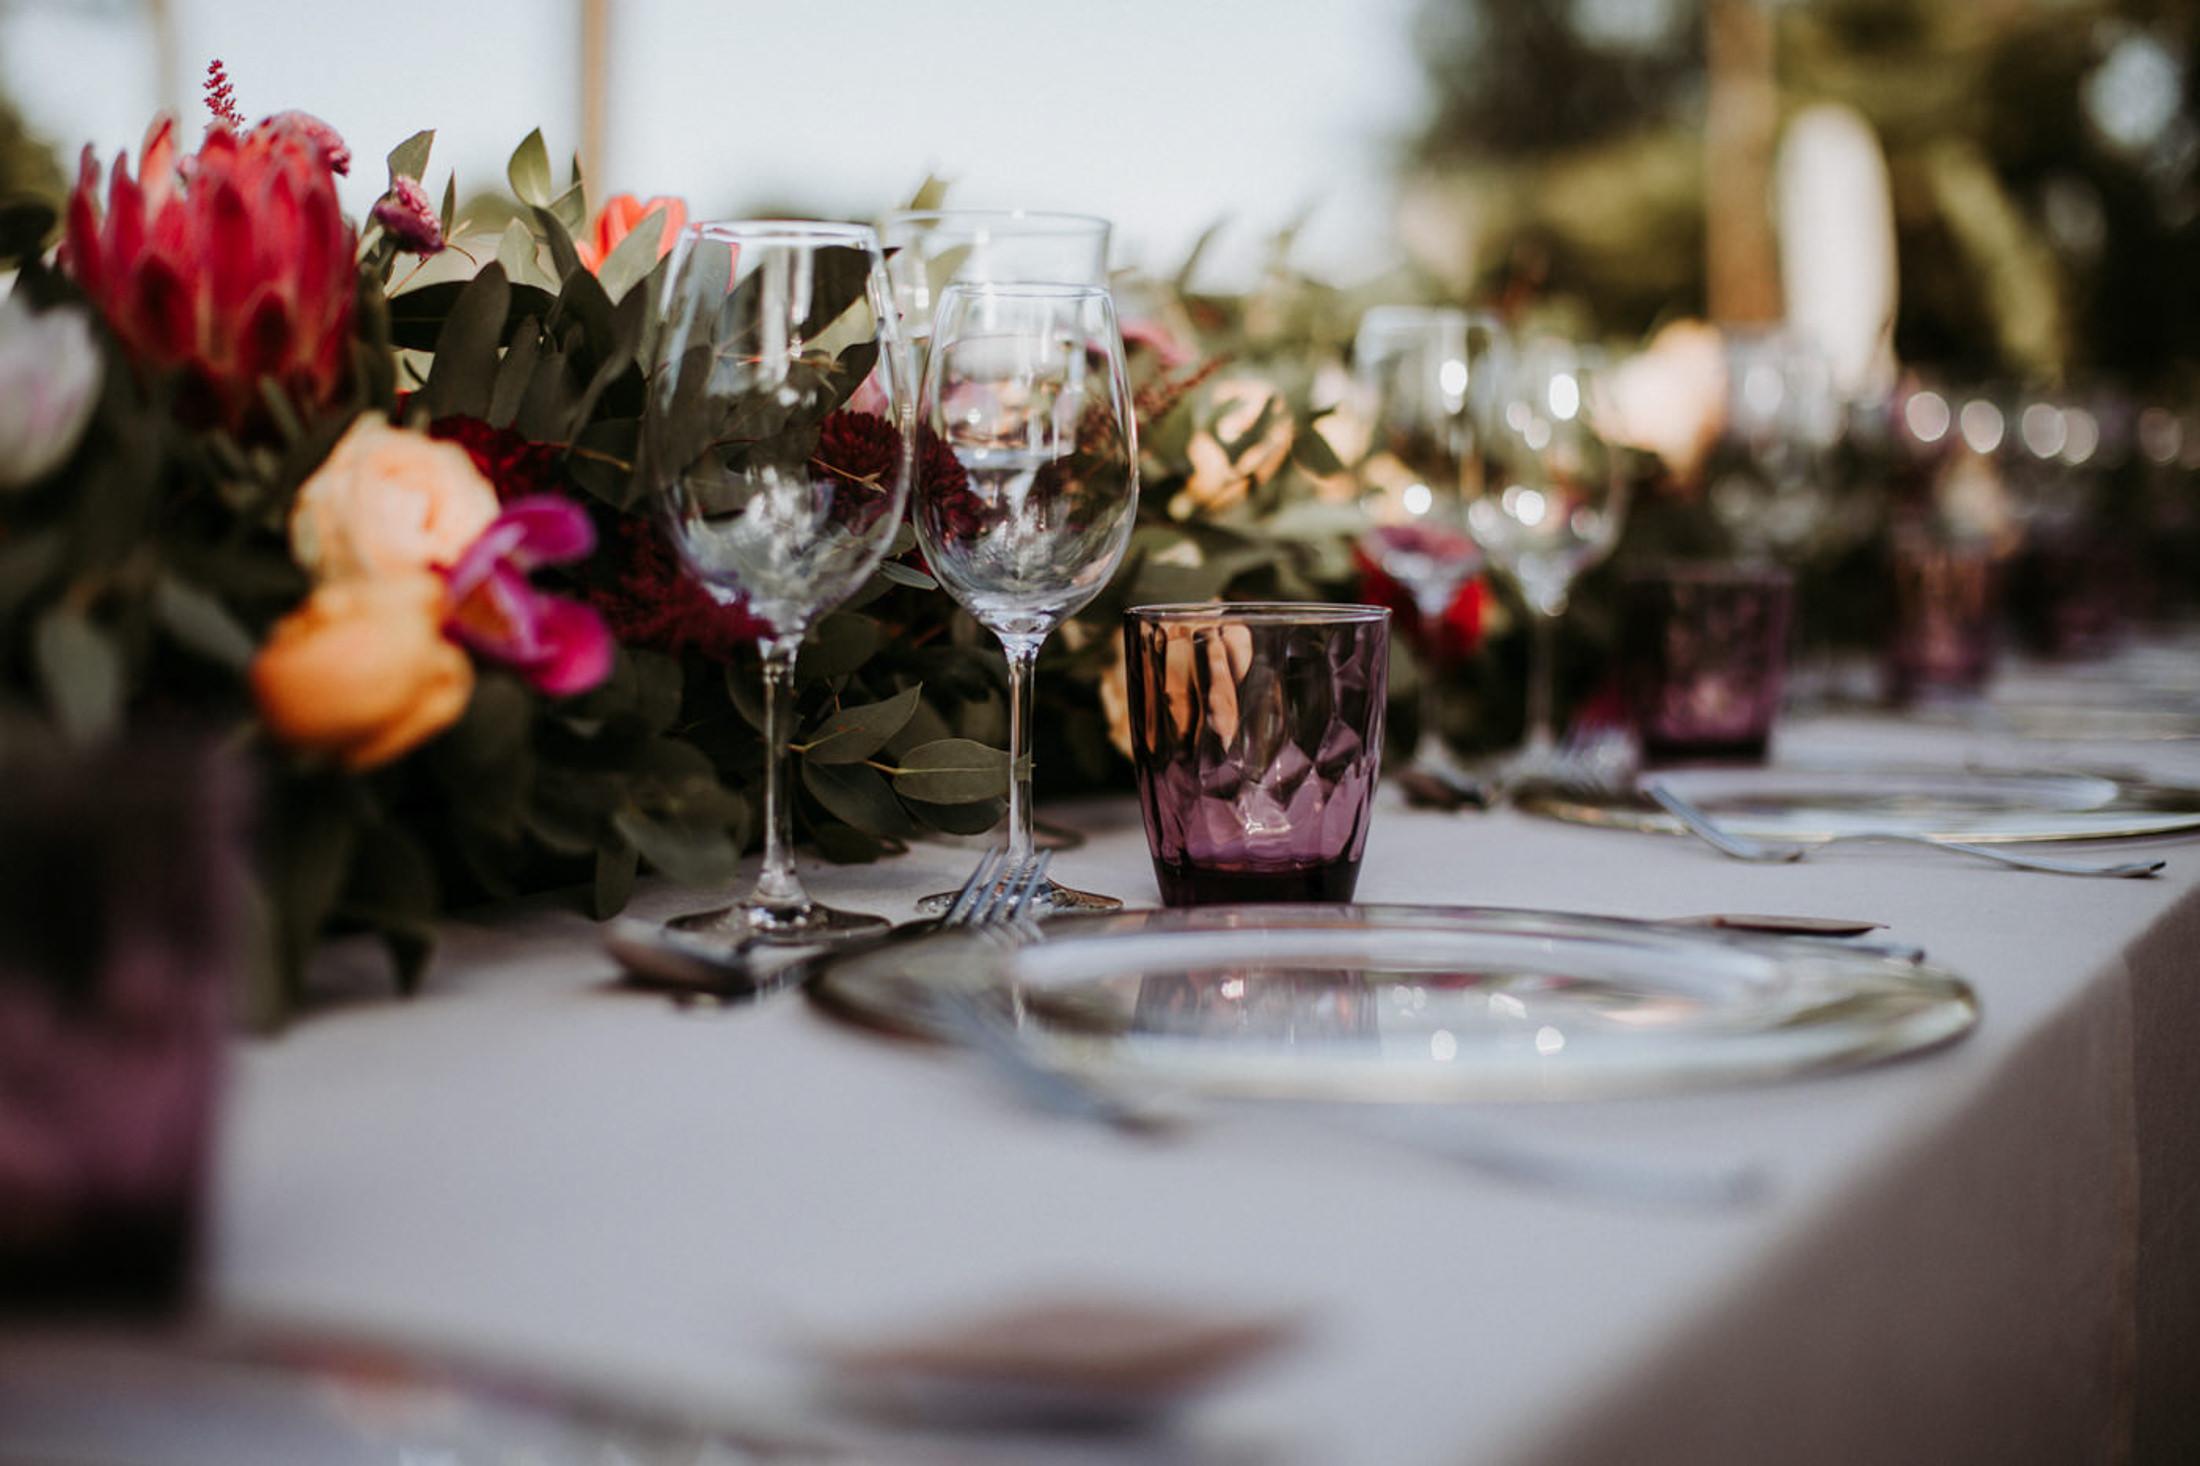 Wedding_Photographer_Mallorca_Daniela-Marquardt_Photography_New_York_Iceland_Tuscany_Santorini_Portugal_Austria_Bavaria_Elopement_Hochzeitsfotograf_AntjeRajat2_96